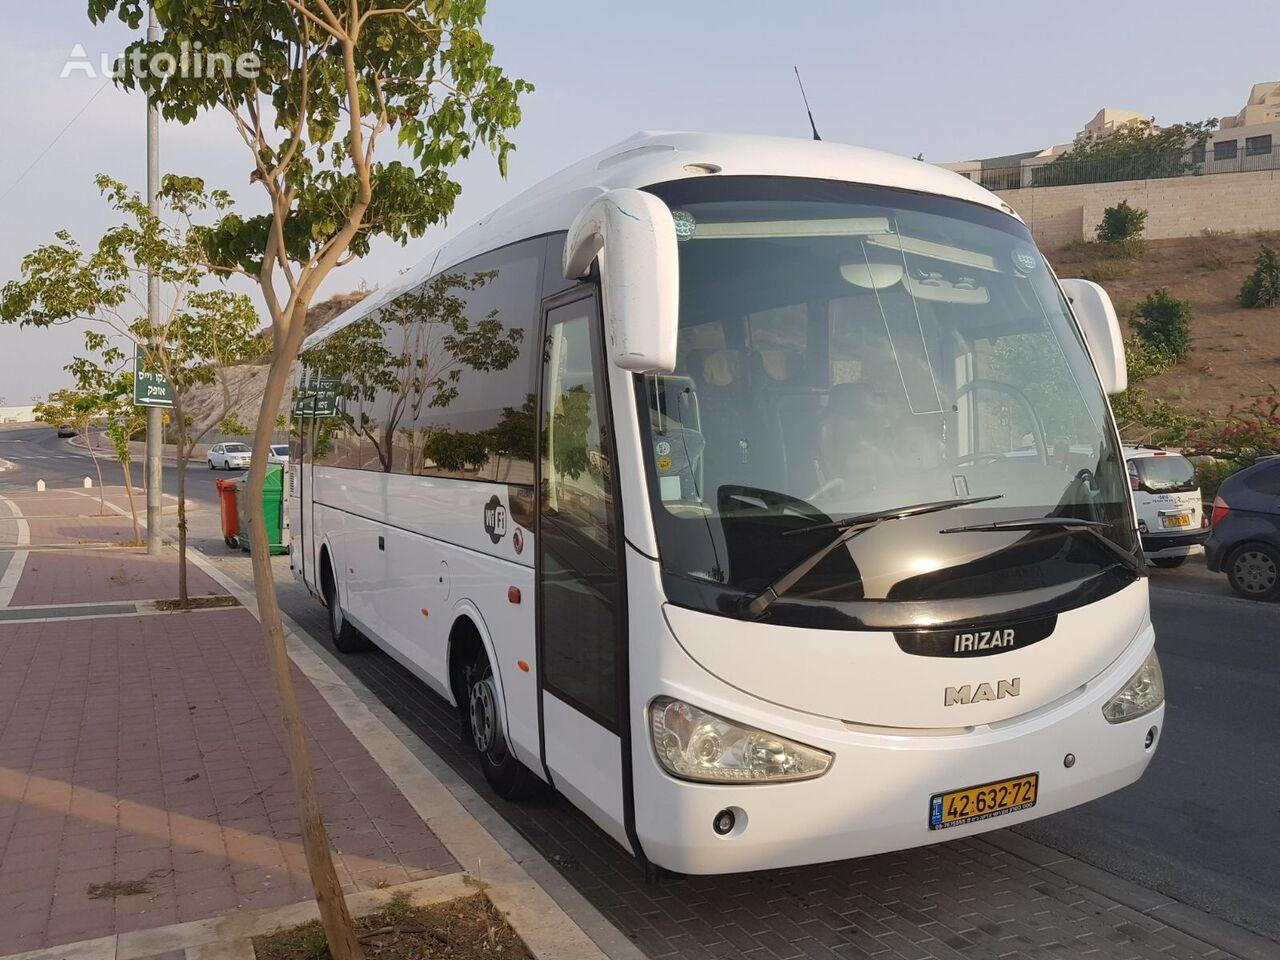 MAN IRIZAR 5 BUSES FOR SALE turistički autobus